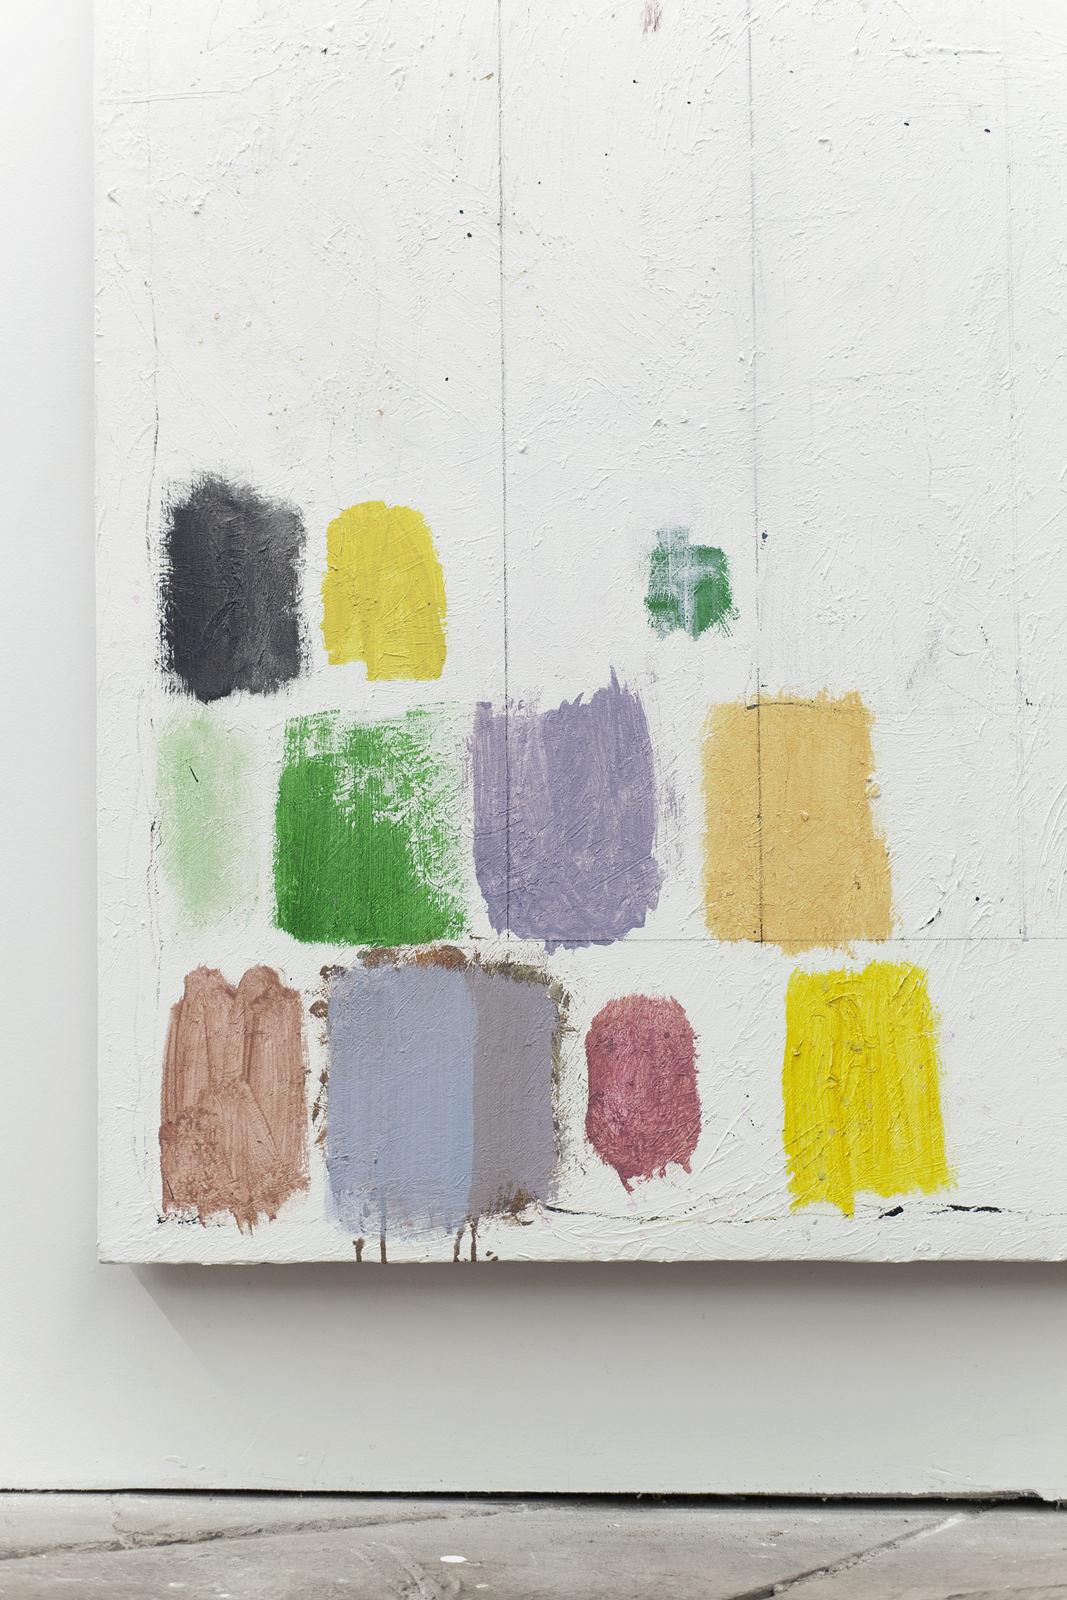 022_Jean-François Lauda. Untitled 39. Acrylic on canvas, collage, cigarette butt.213.5 x 183 cm. 2012_2016. (Detail)